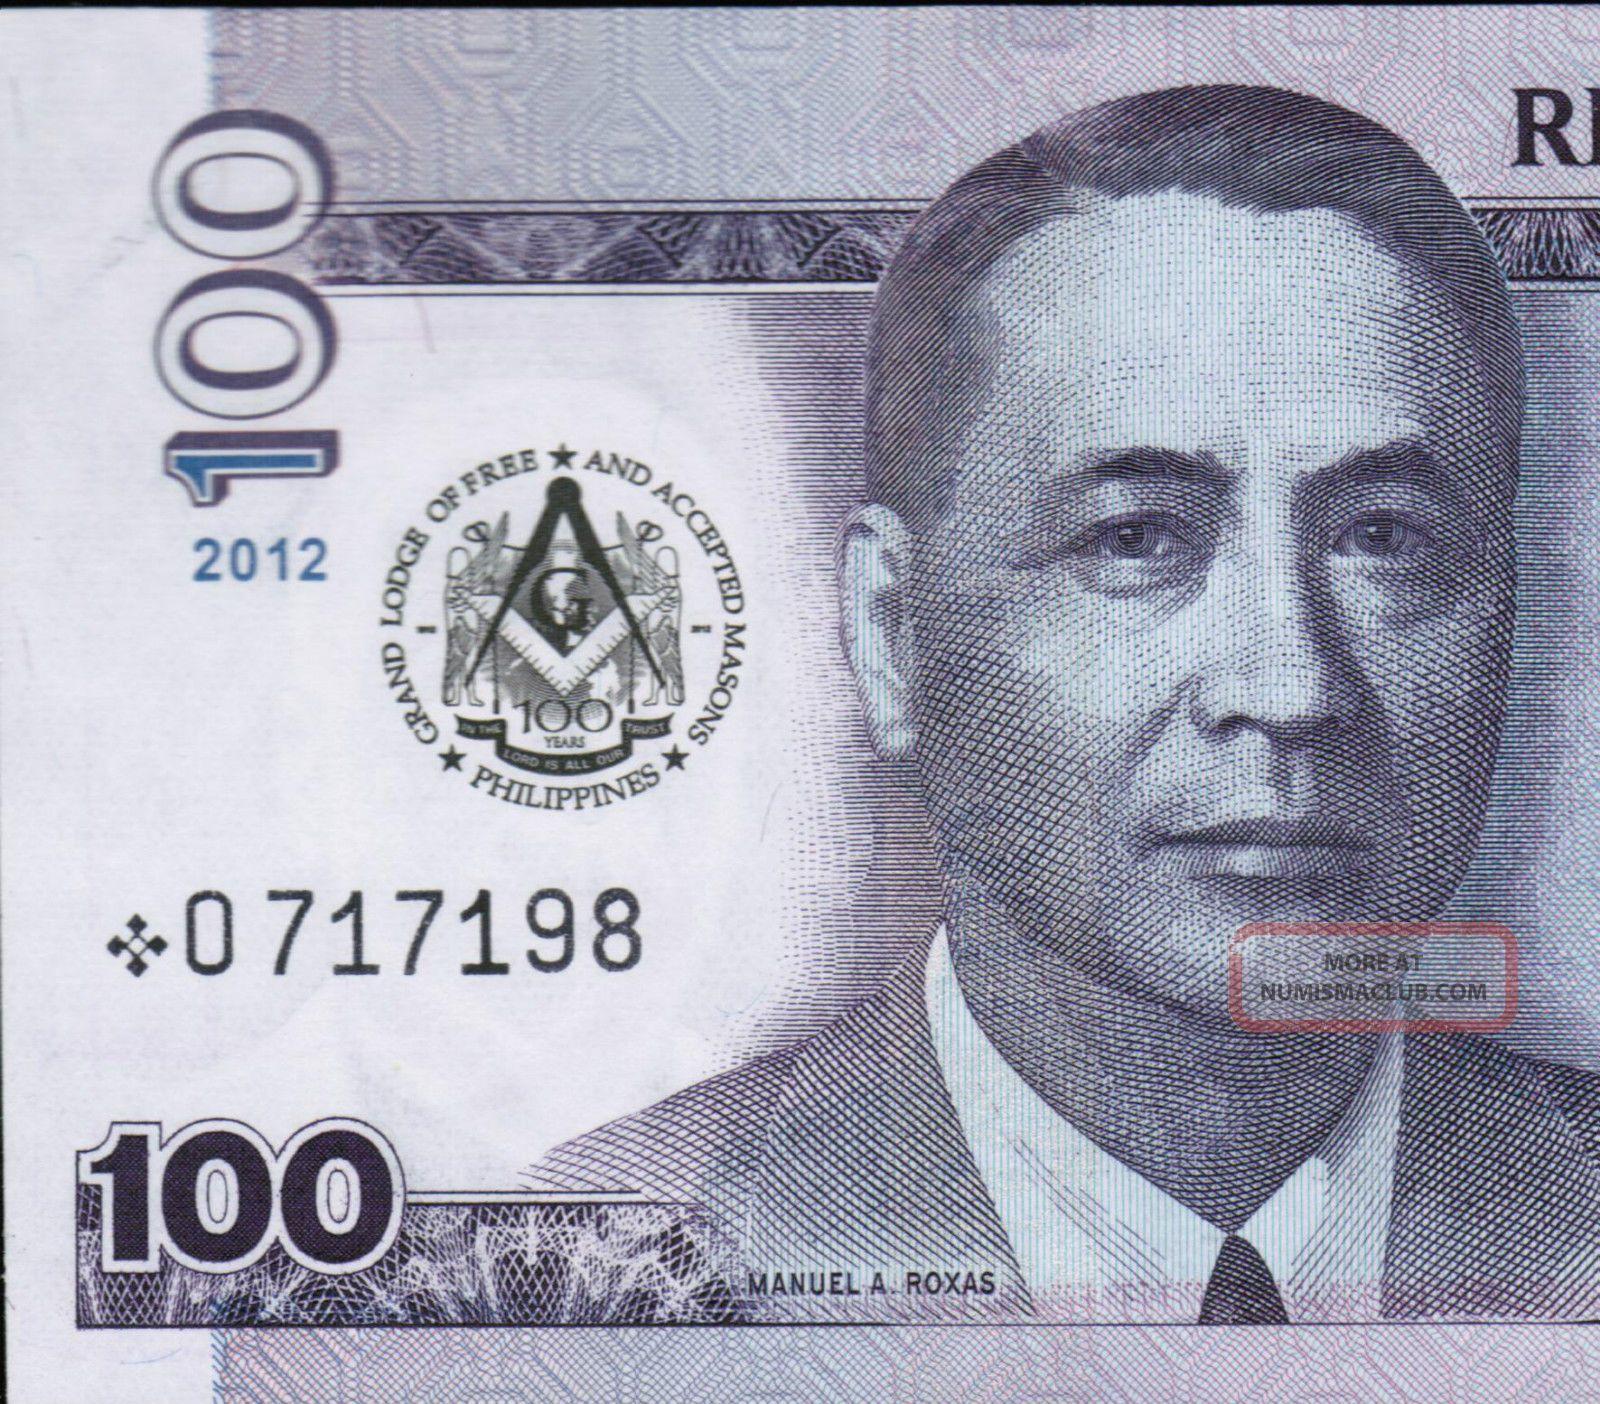 http://numismaclub.com/imgs/a/e/y/a/j/2012_philippines_100_peso_100th_annivesary_masons_commemorative_star_note__unc_1_lgw.jpg